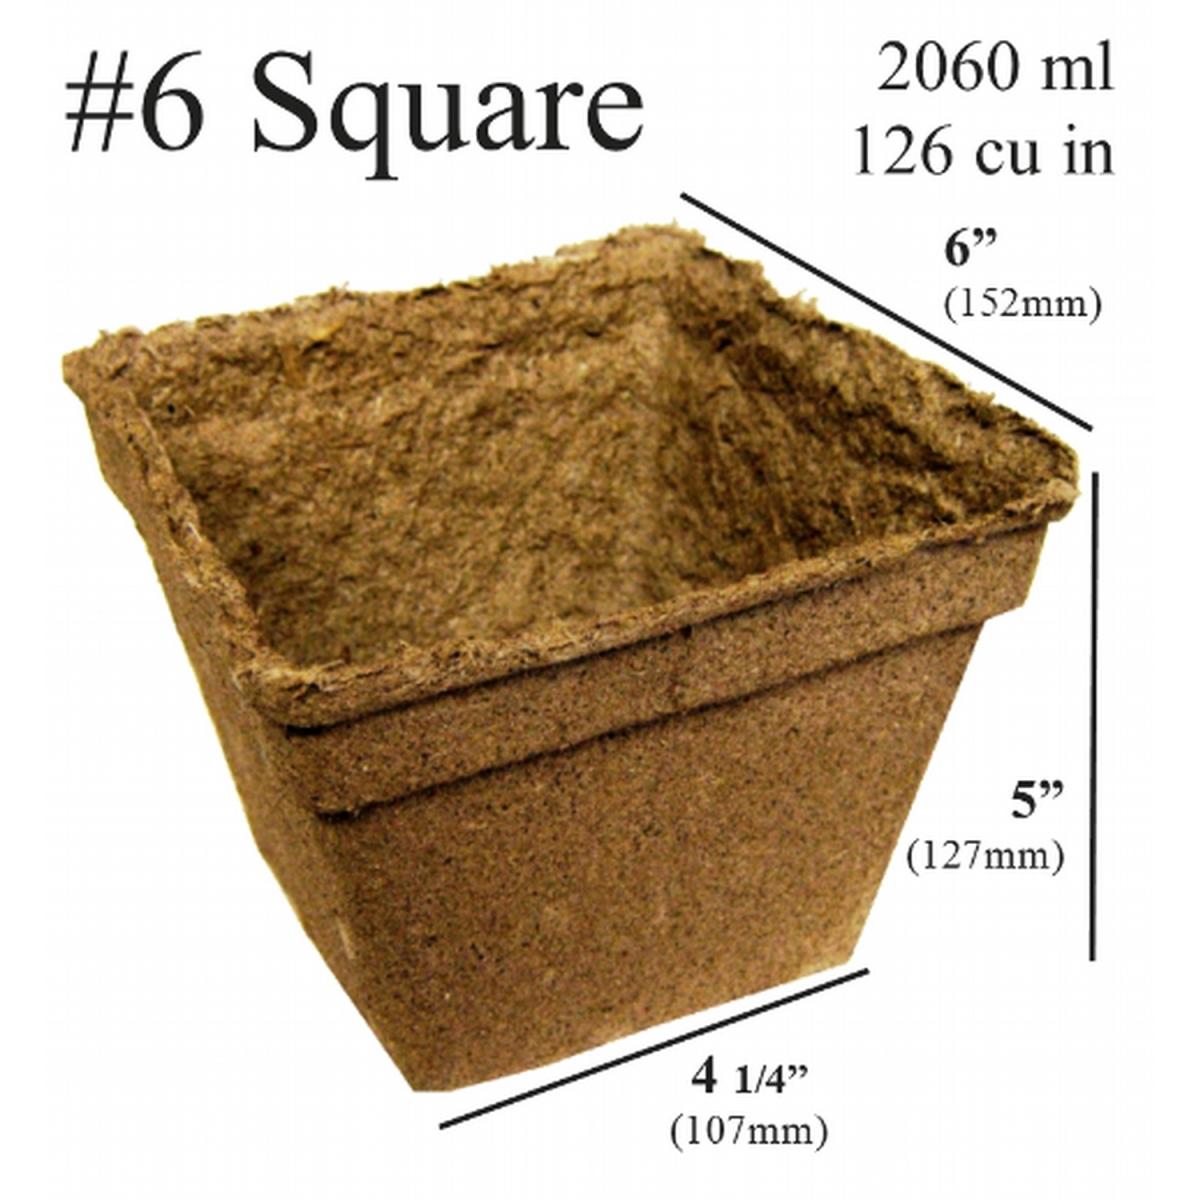 CowPots No.6 Sq-16 6 in. Square Pot 2060 ml - 126 Cu. in. - Pots of 16